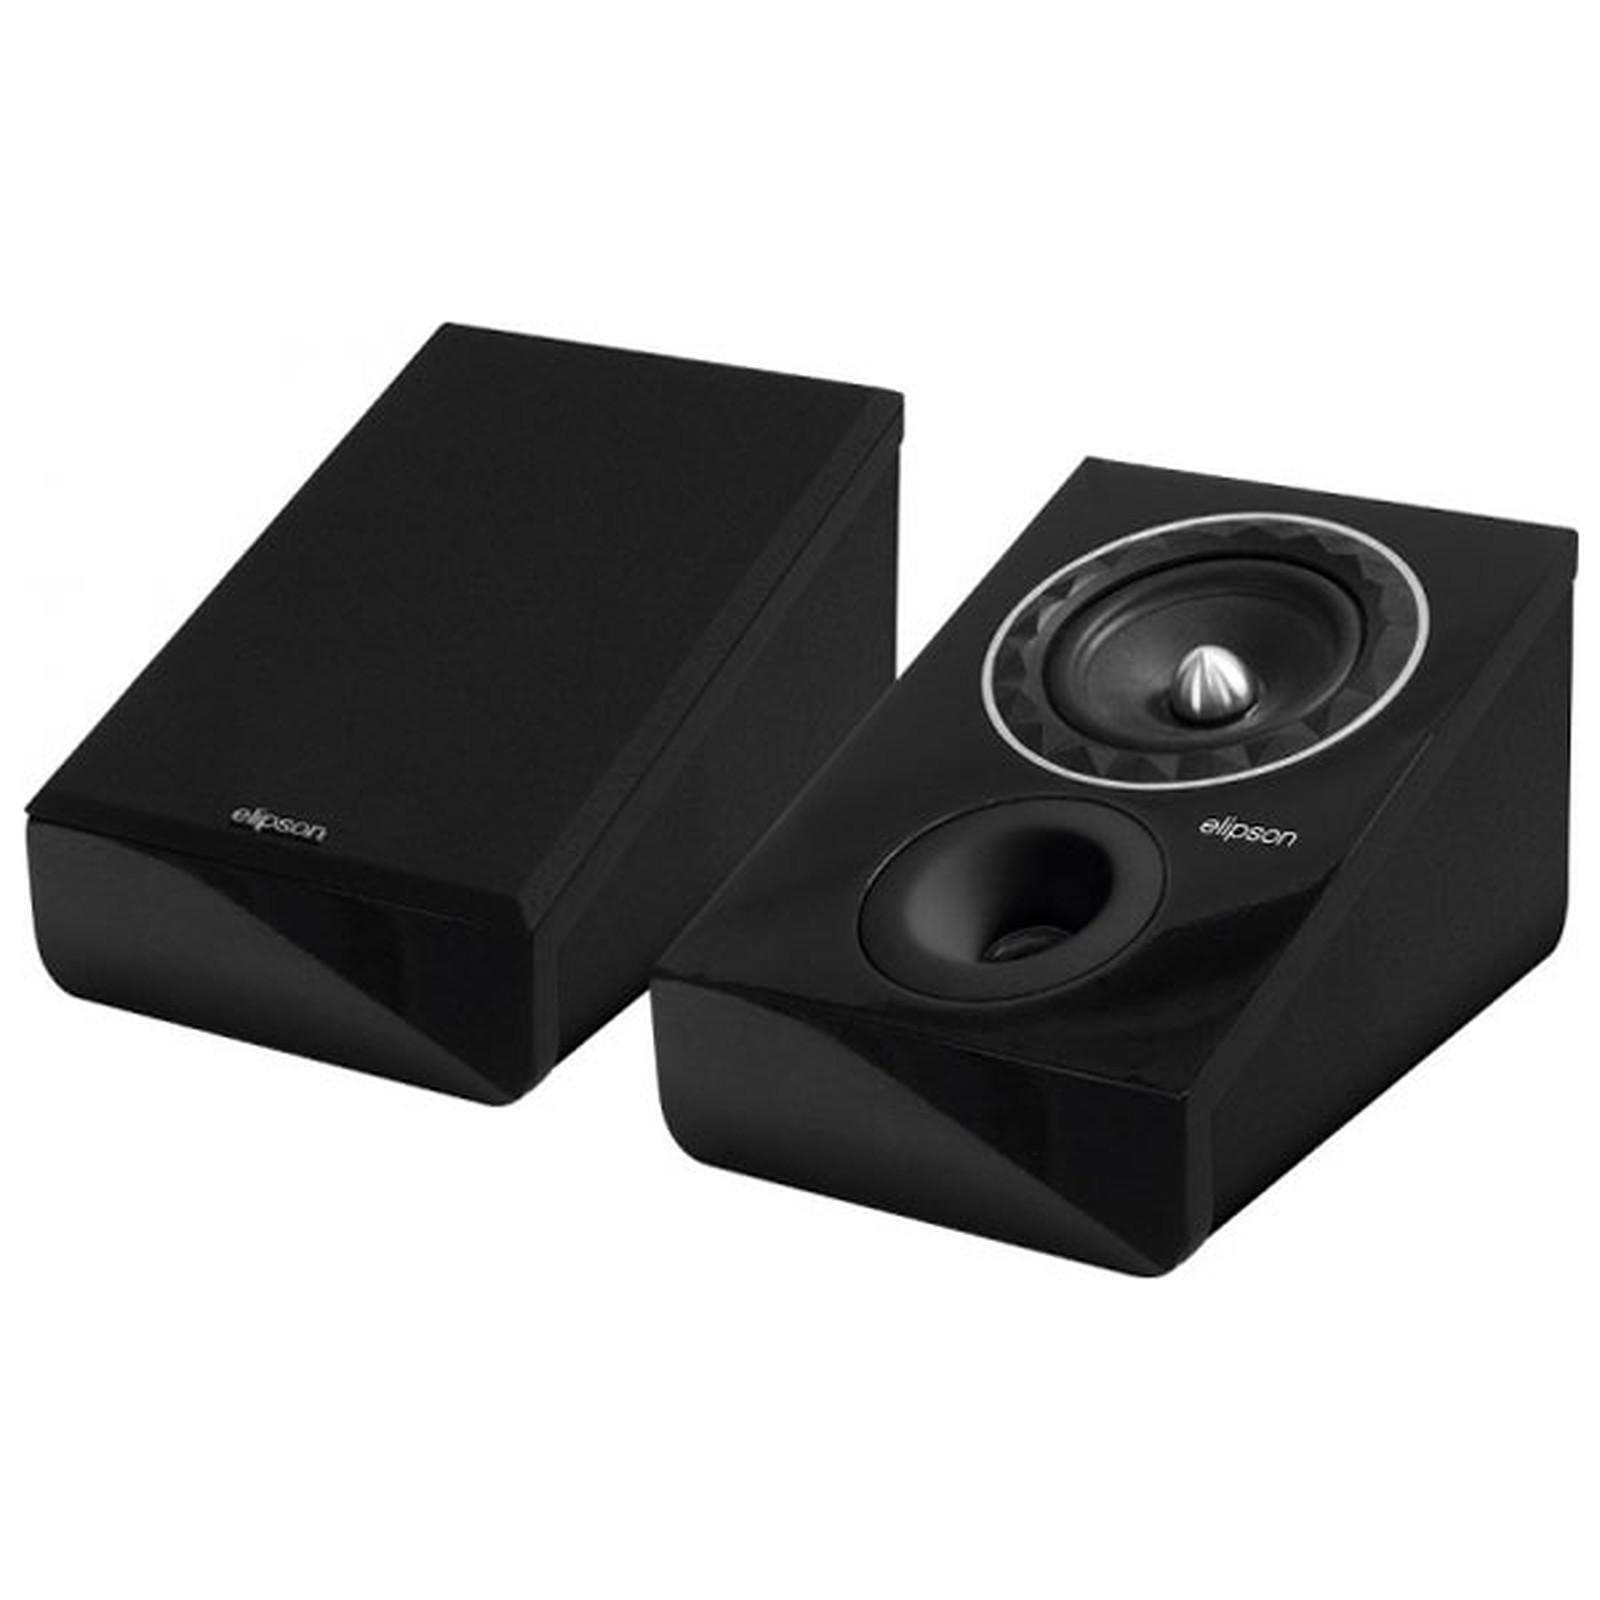 Elispon Prestige Facet 6 Atmos Preta Par de Caixas Surround Dolby Atmos  - Audio Video & cia